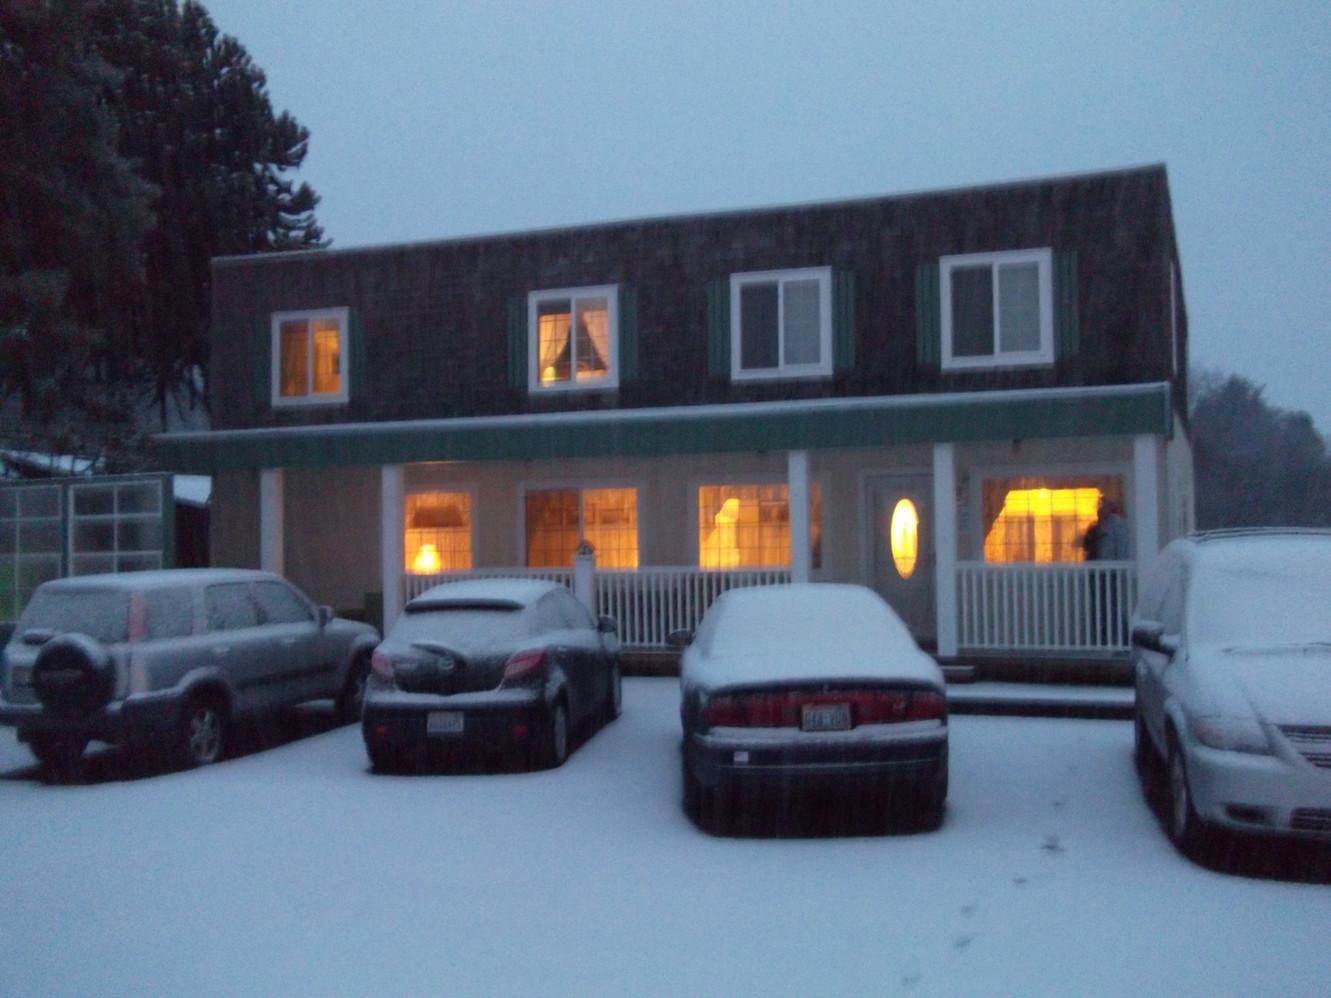 2012 ~ Our SASH Team Retreat Location, Snowed In!